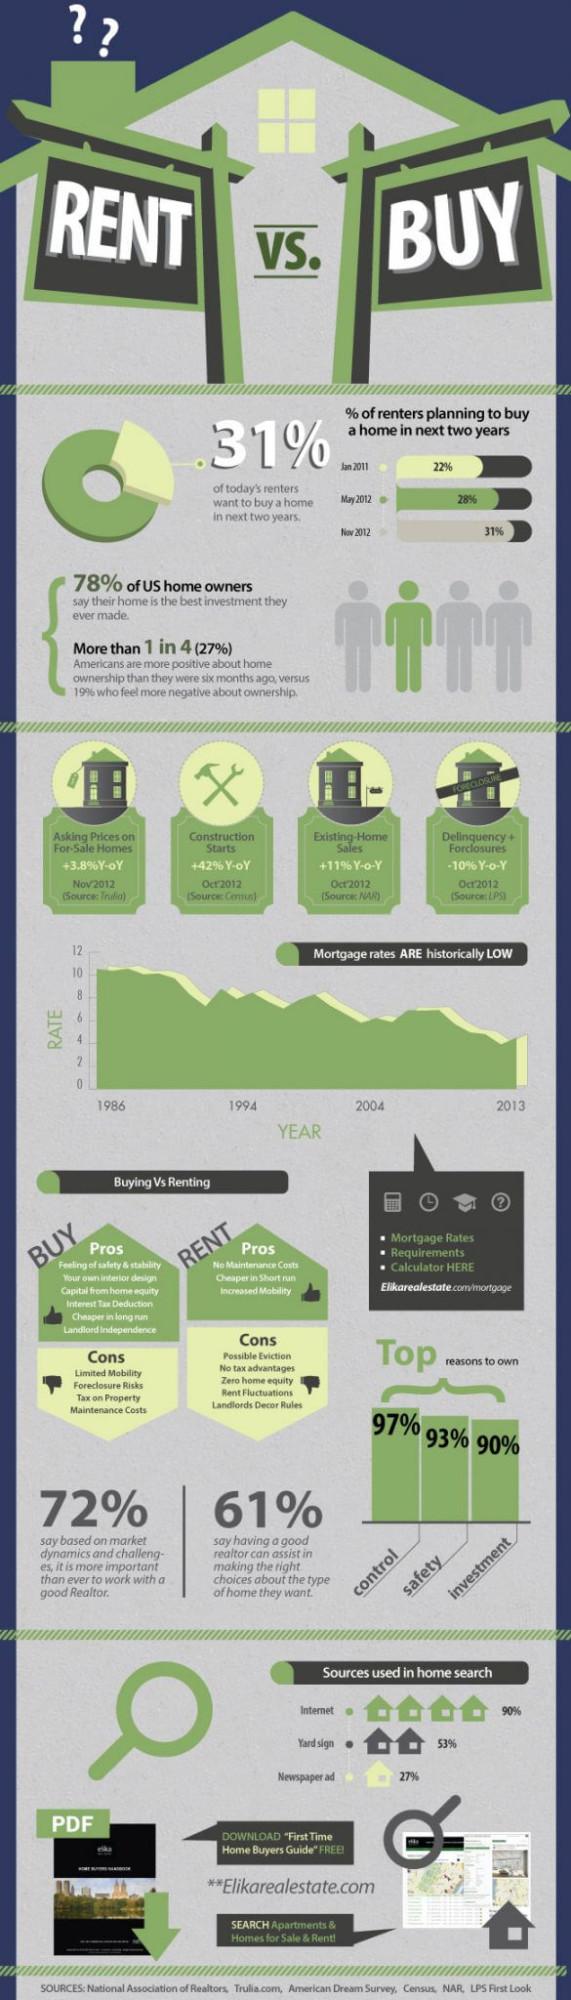 Buy vs. Rent Infographic